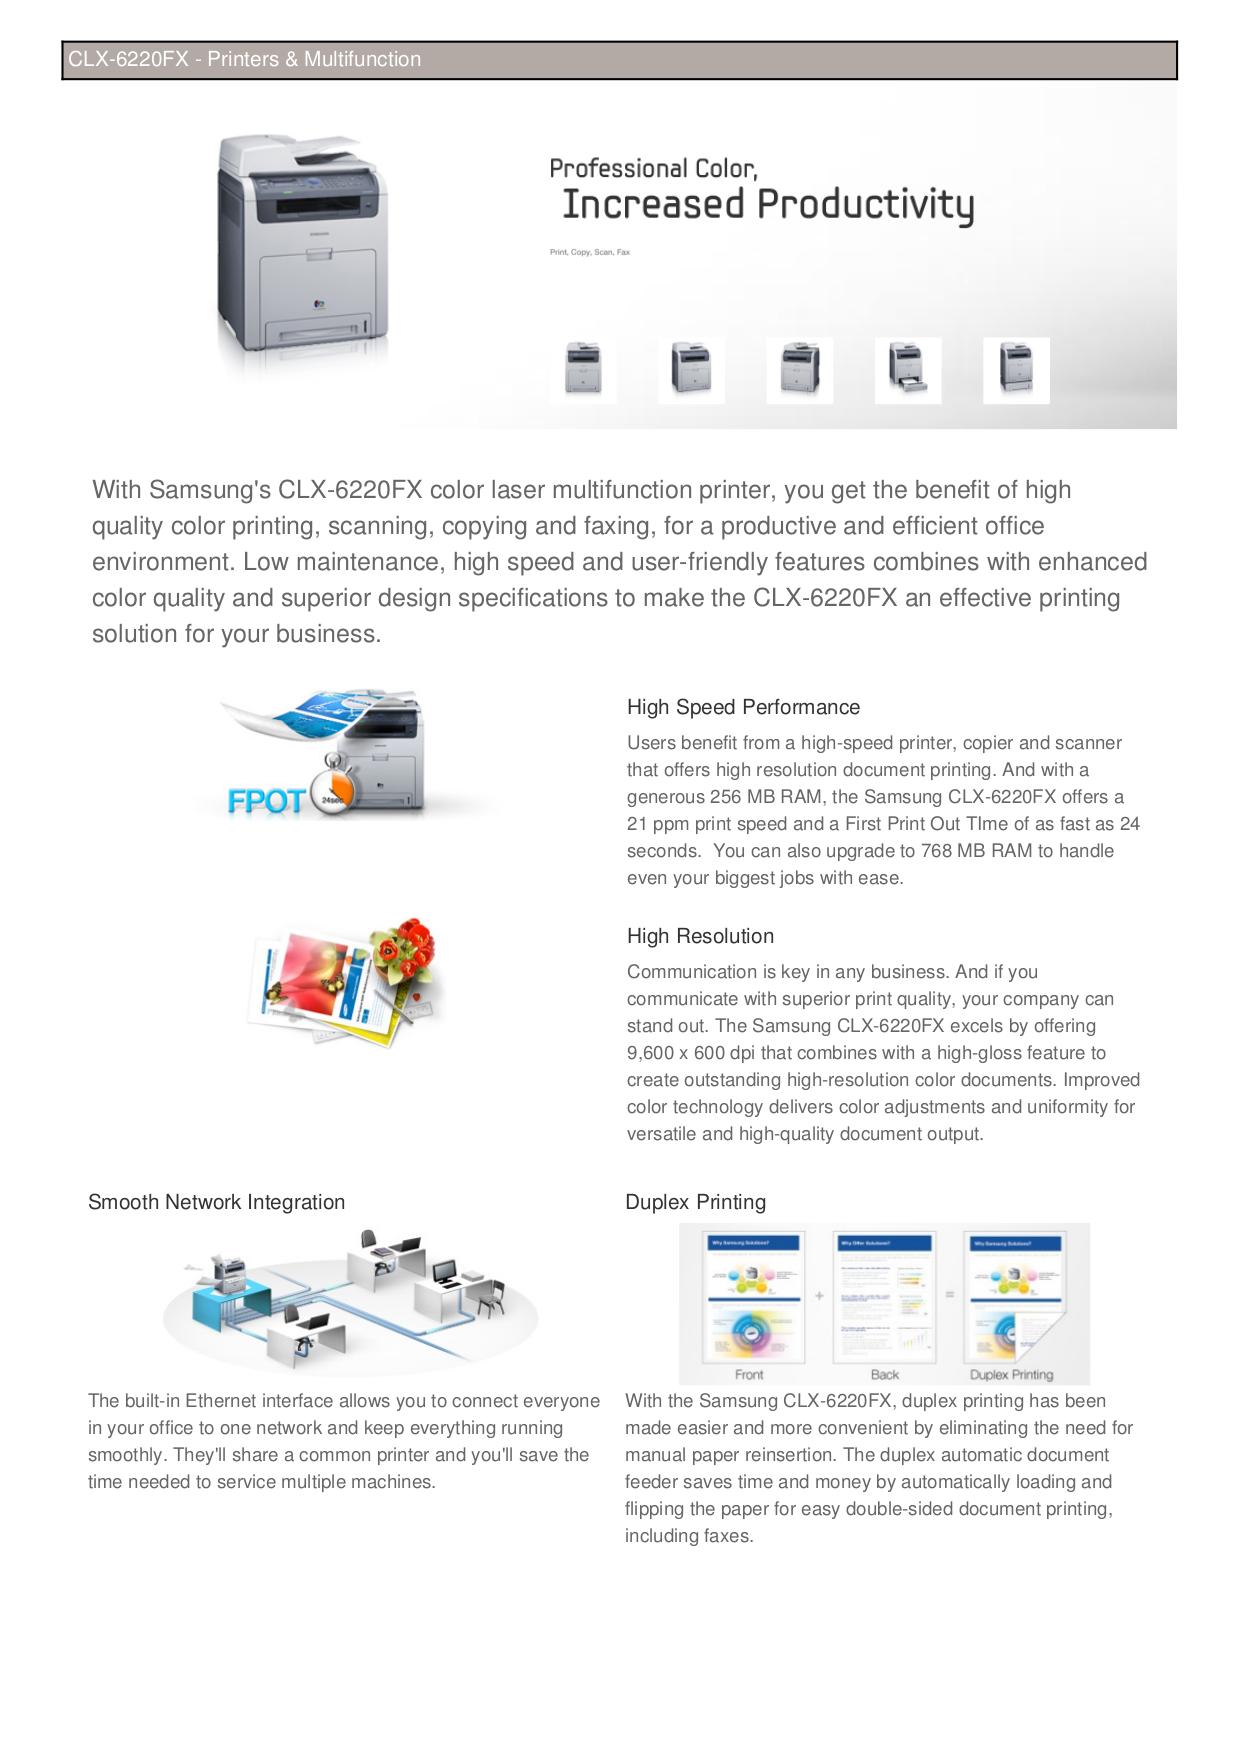 pdf for Samsung Multifunction Printer CLX-6220FX manual